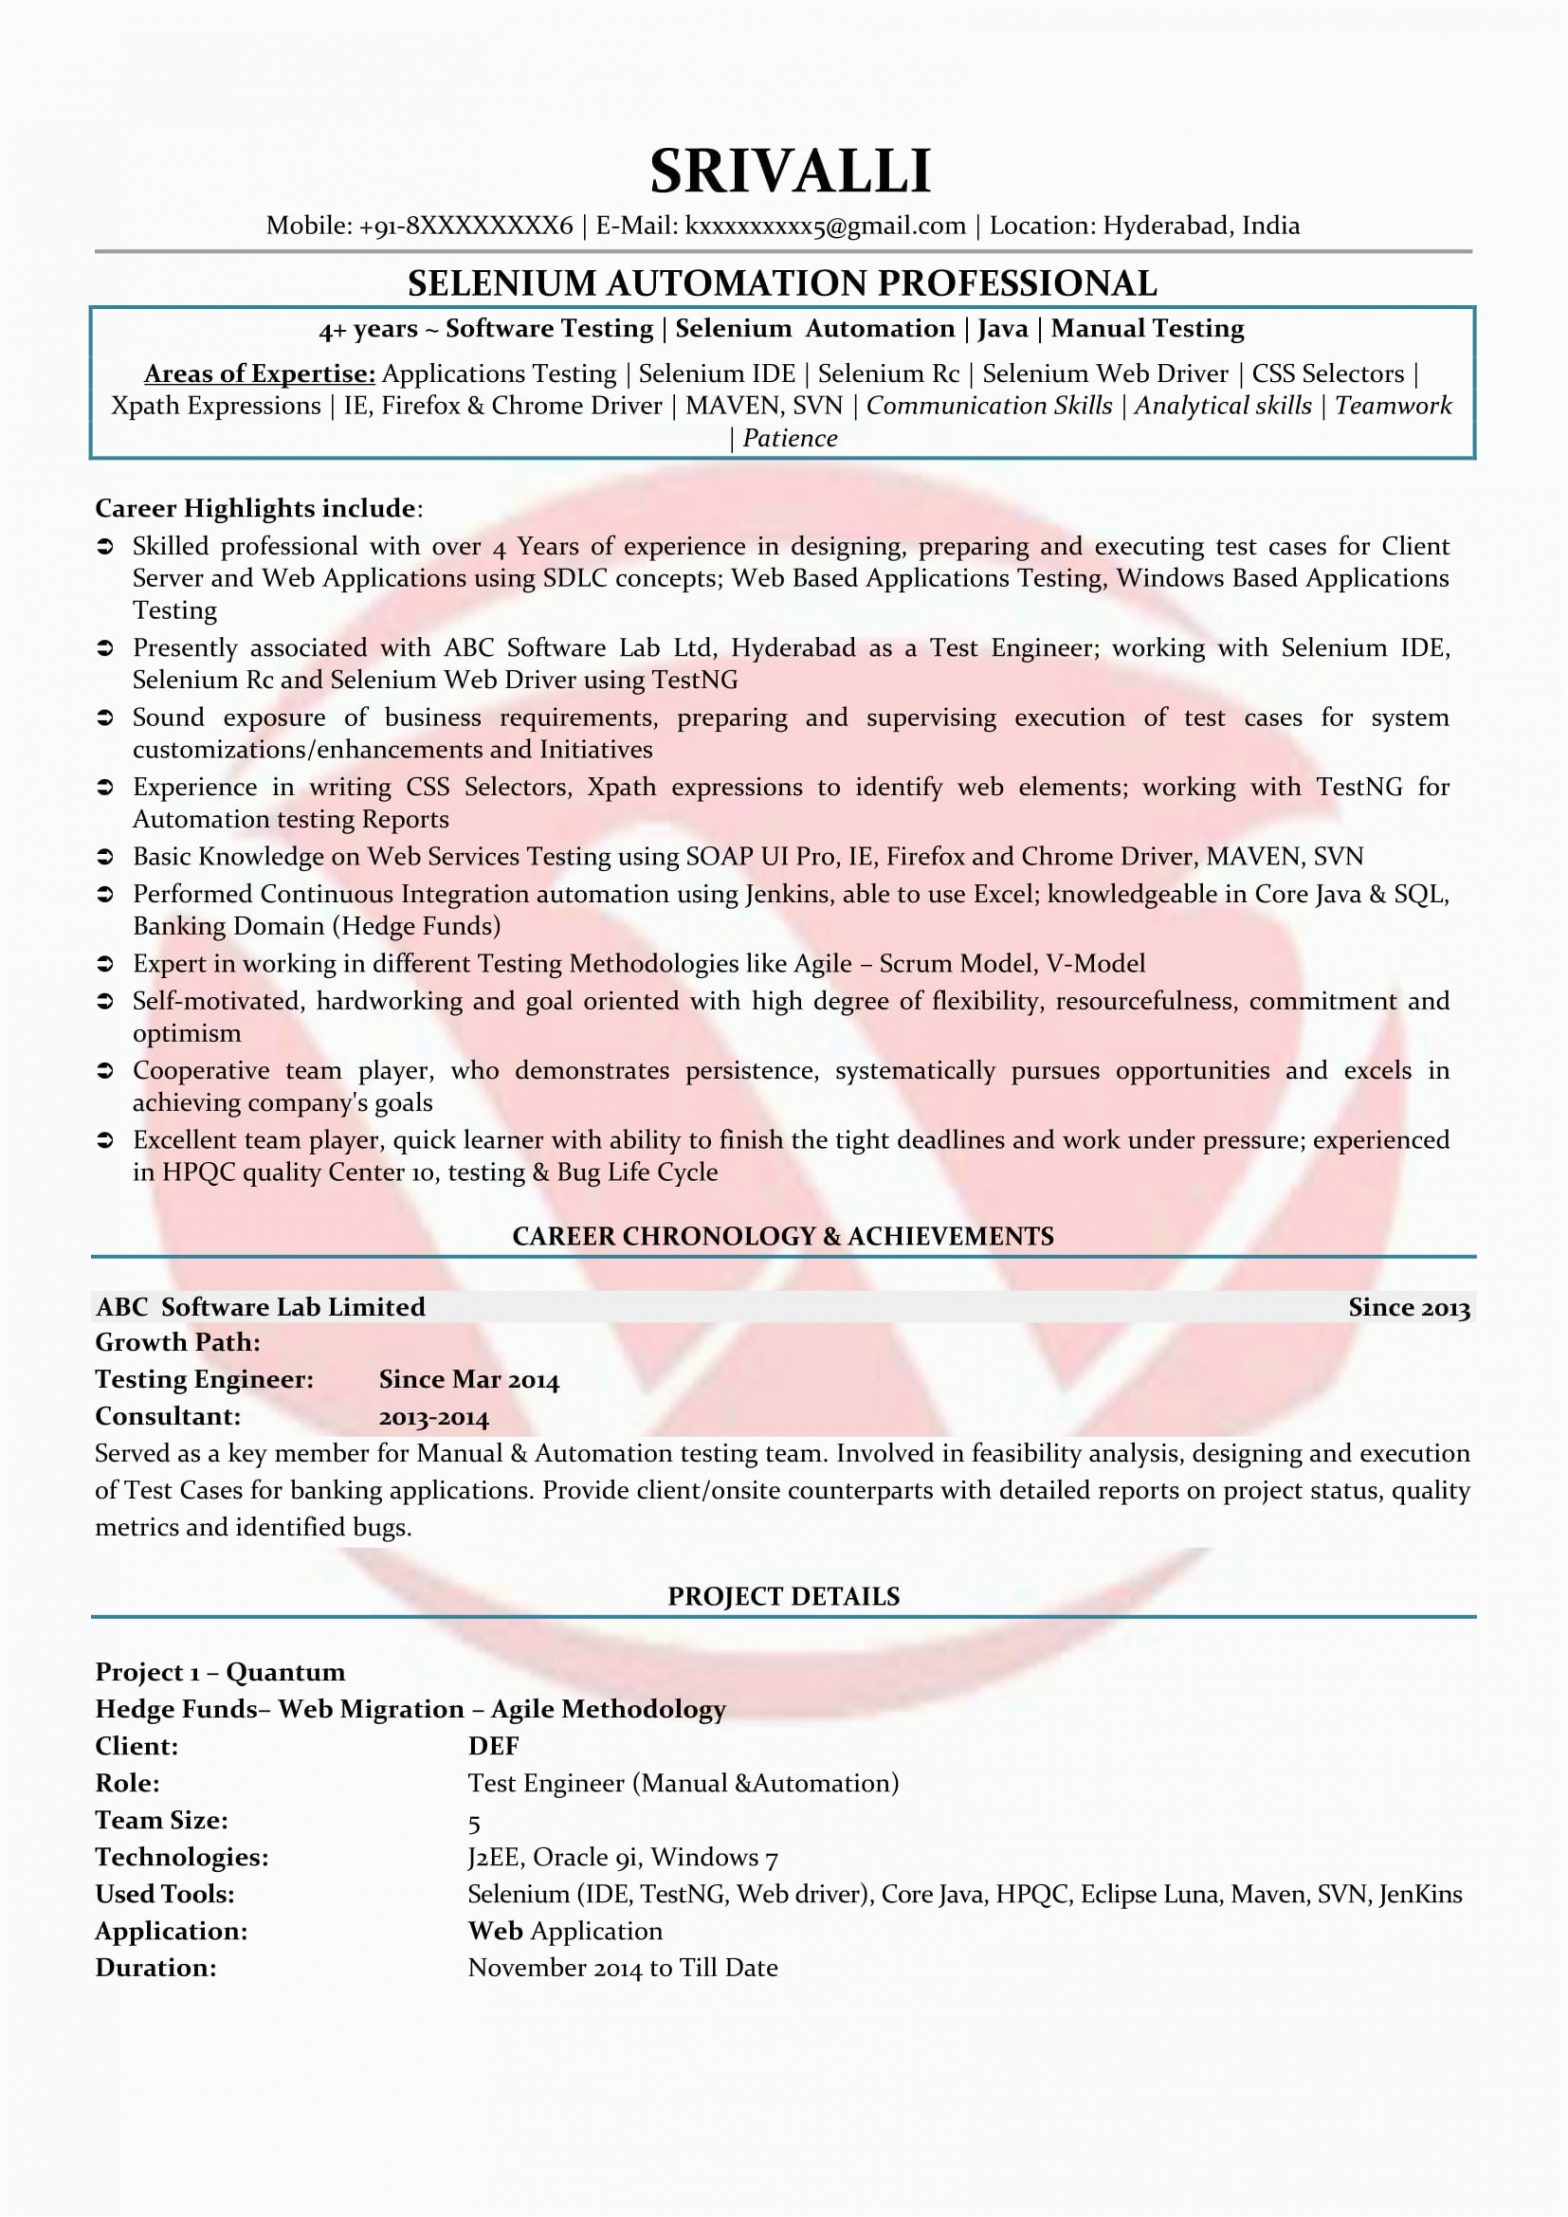 Sample Resume for Selenium 1 Year Experience Selenium Sample Resumes Download Resume format Templates